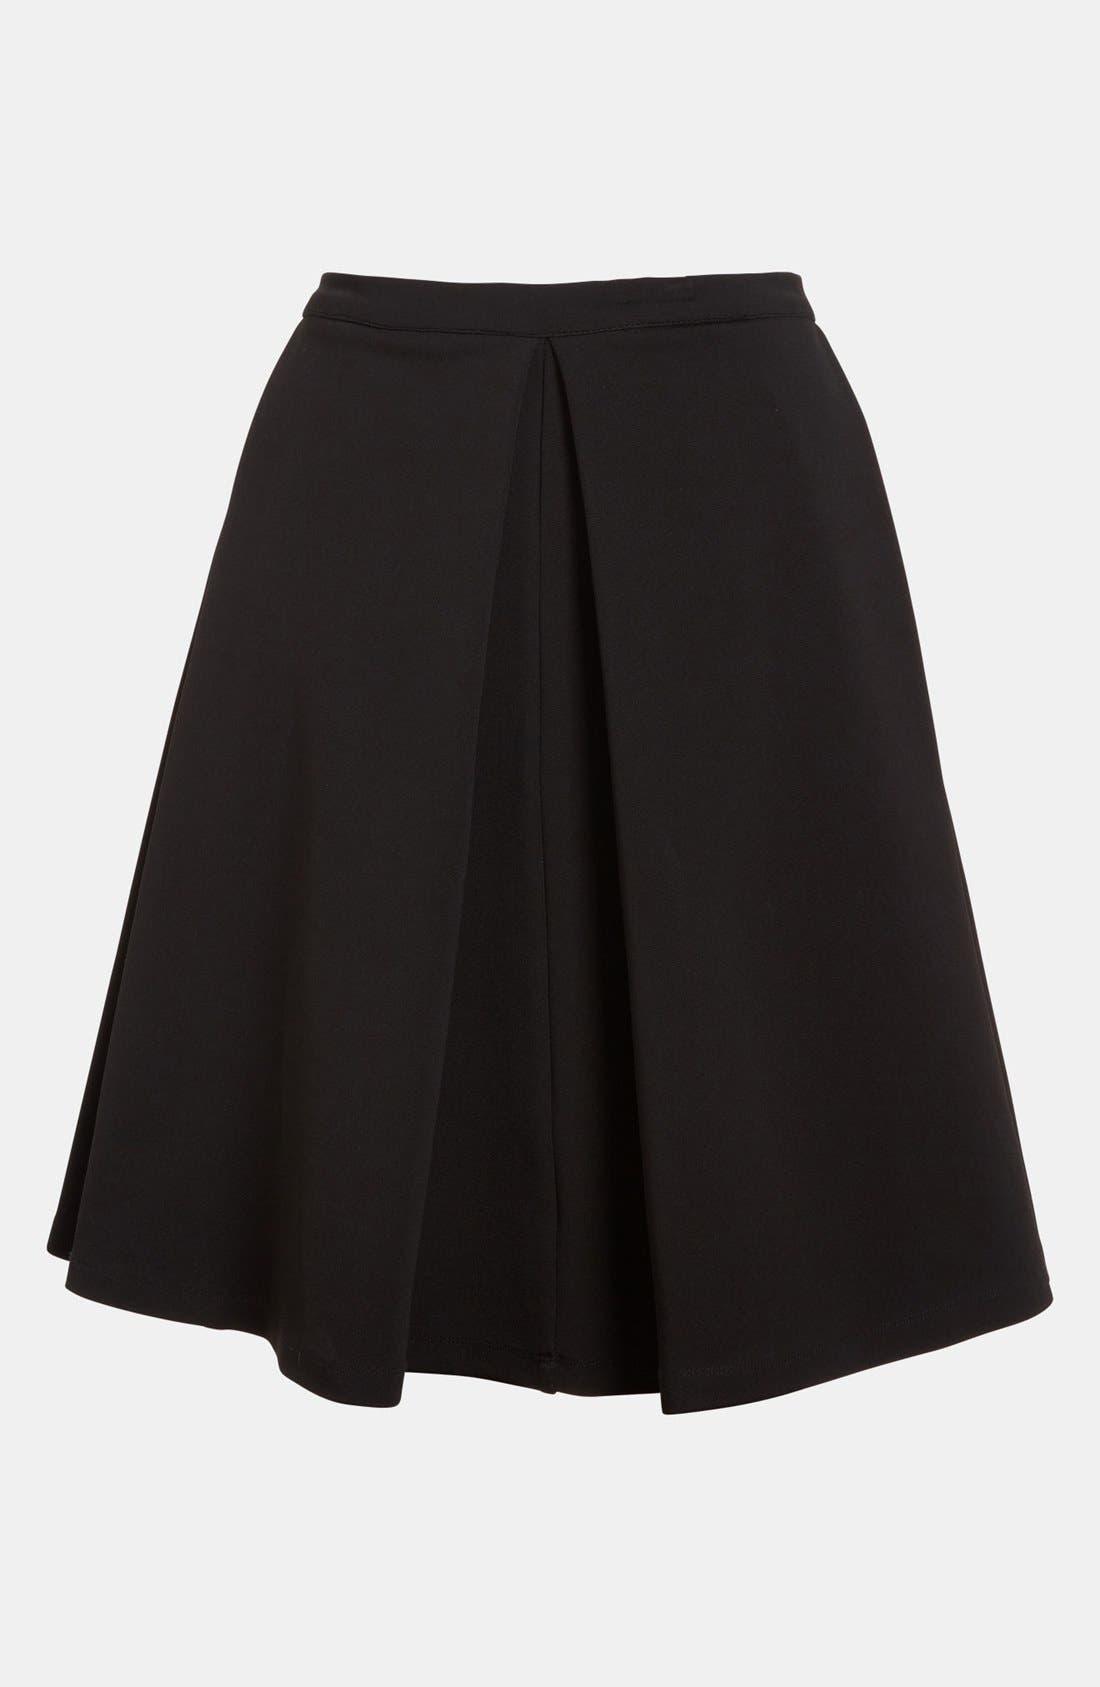 DEVLIN, Pleated Skirt, Main thumbnail 1, color, 001